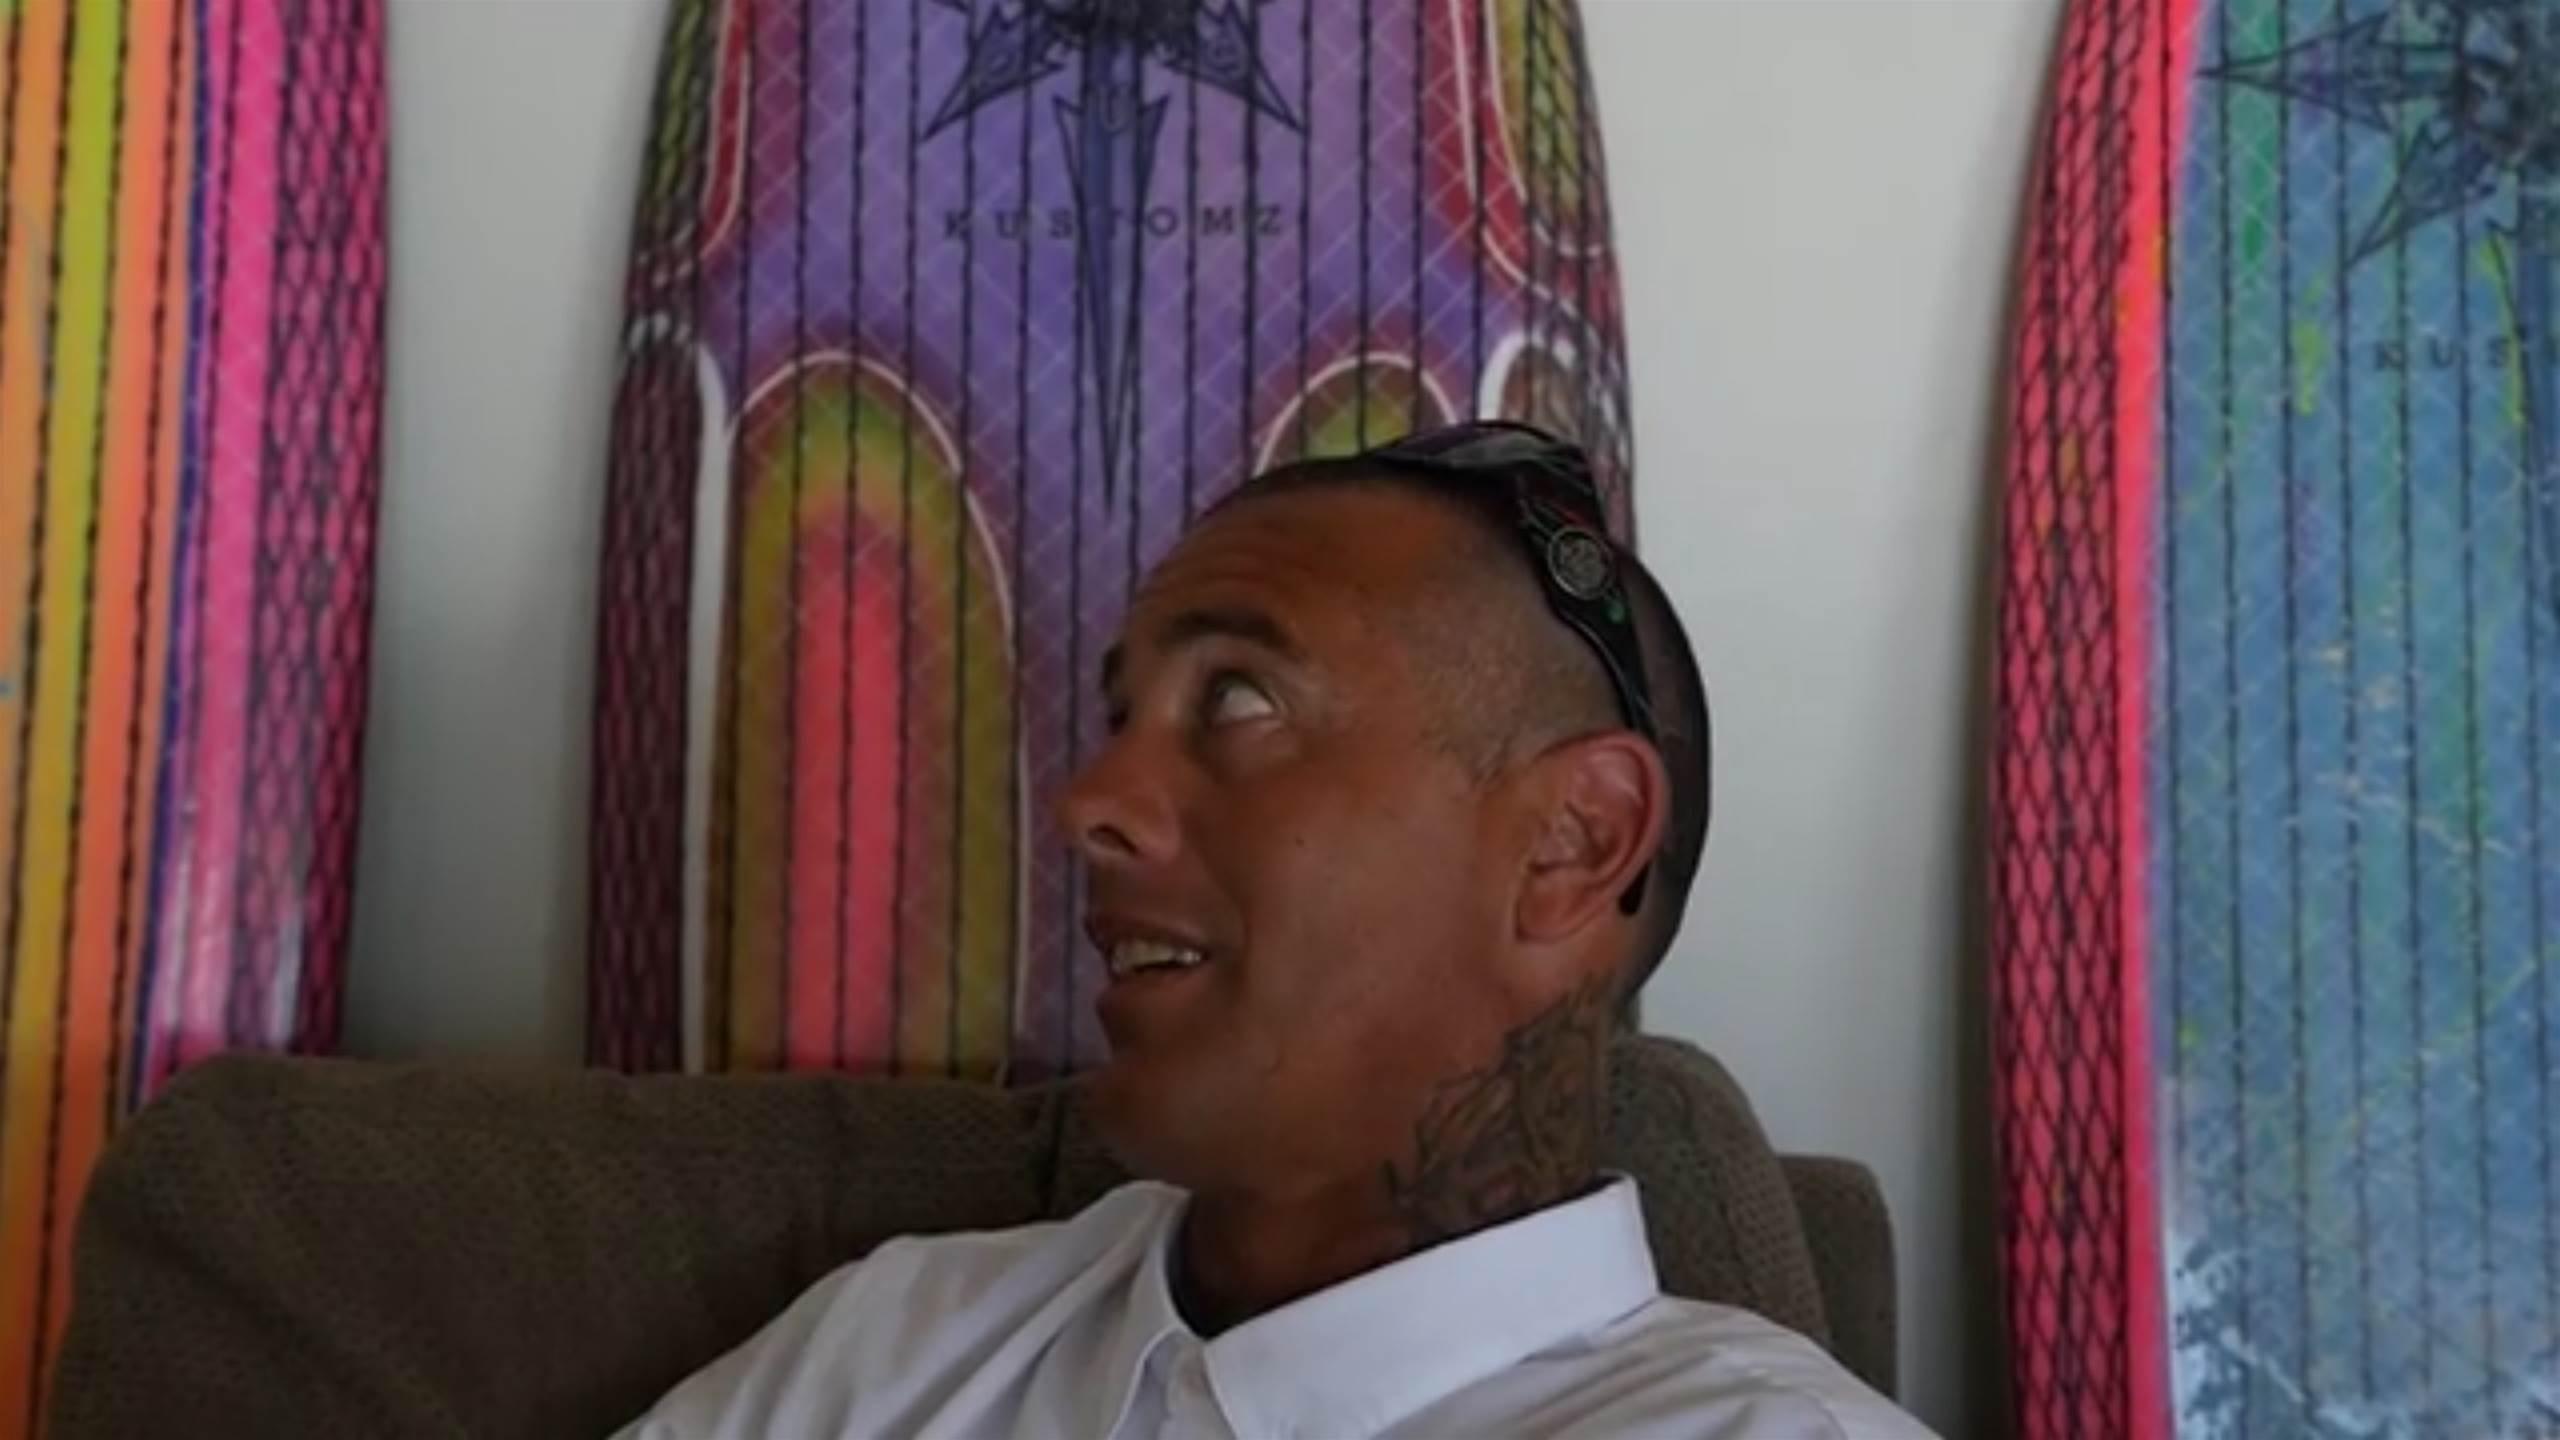 The Christian Fletcher Files – On Progressive Surfing